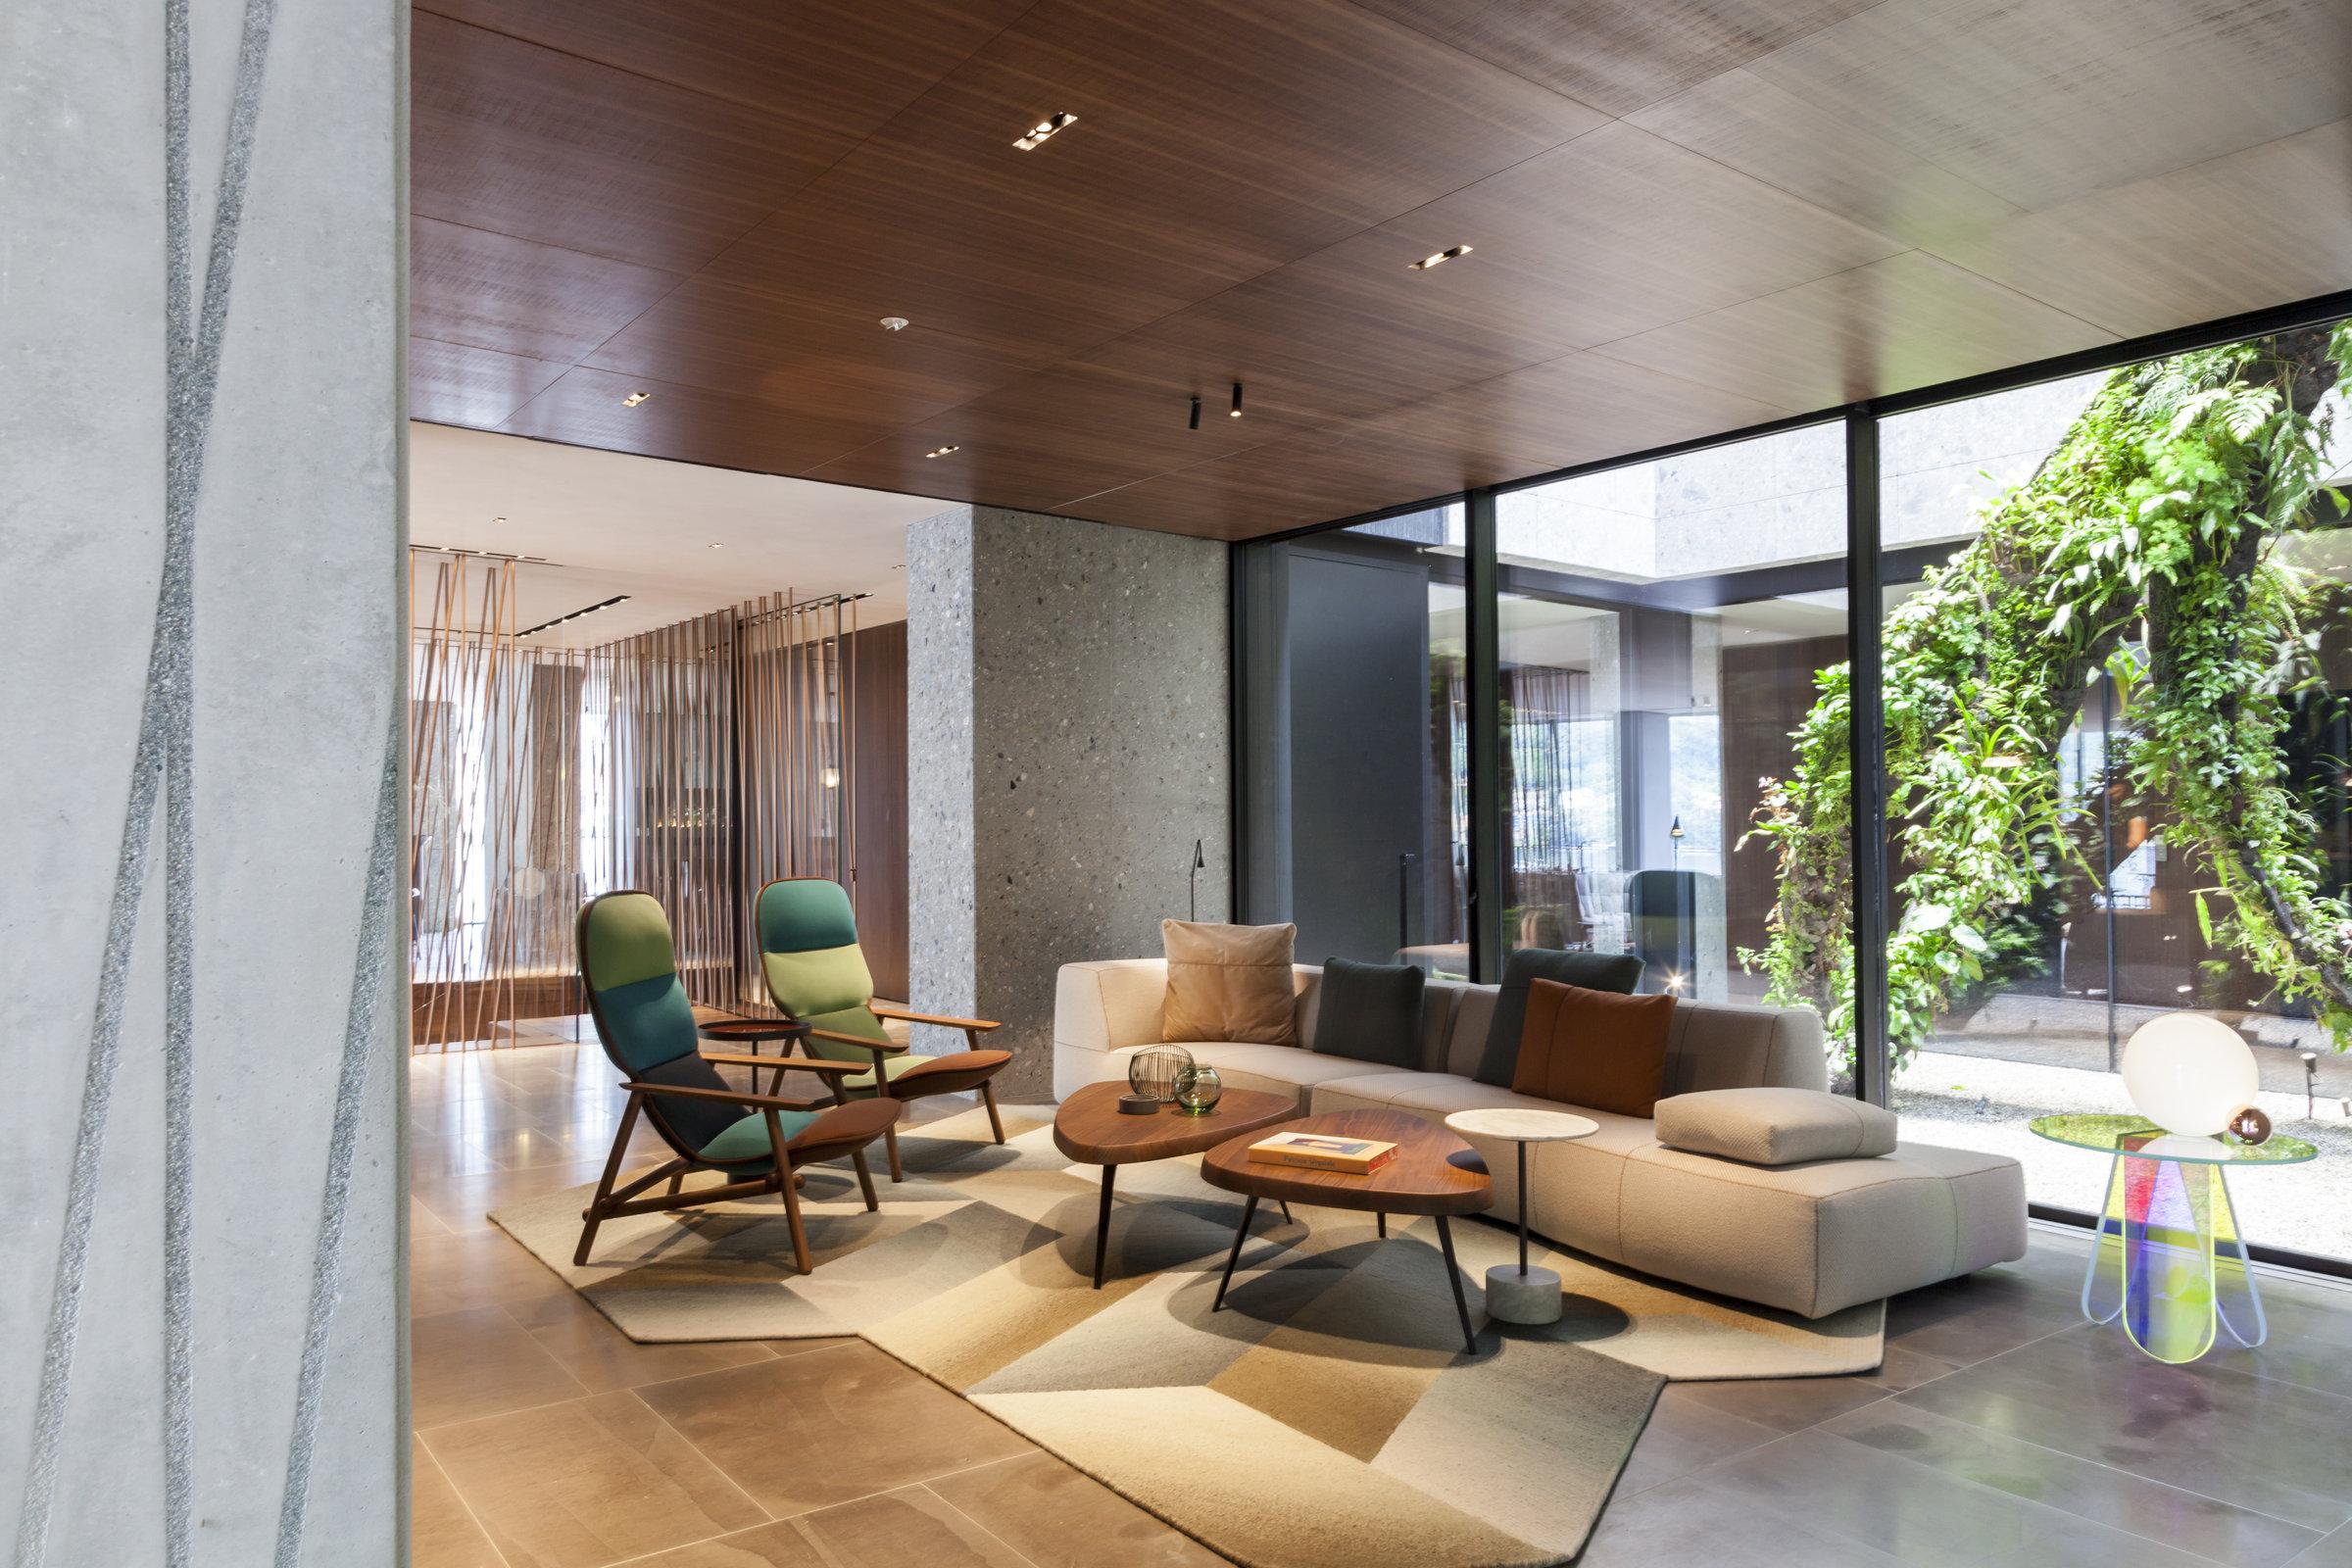 Hotel Il Sereno Lago de Como pela designer Patricia Urquiola  #877644 2400x1600 Acessorios Banheiro Hotel